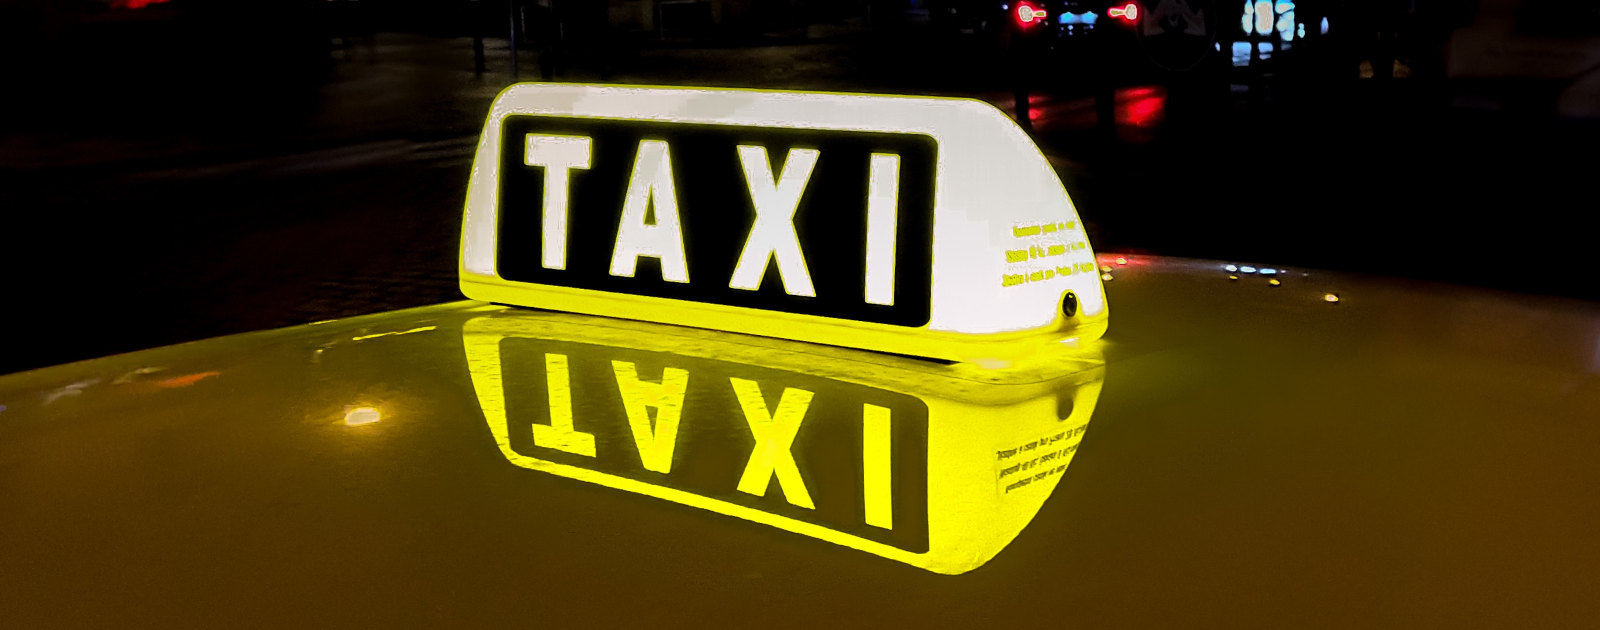 Dachbeleuchtung eines Taxis